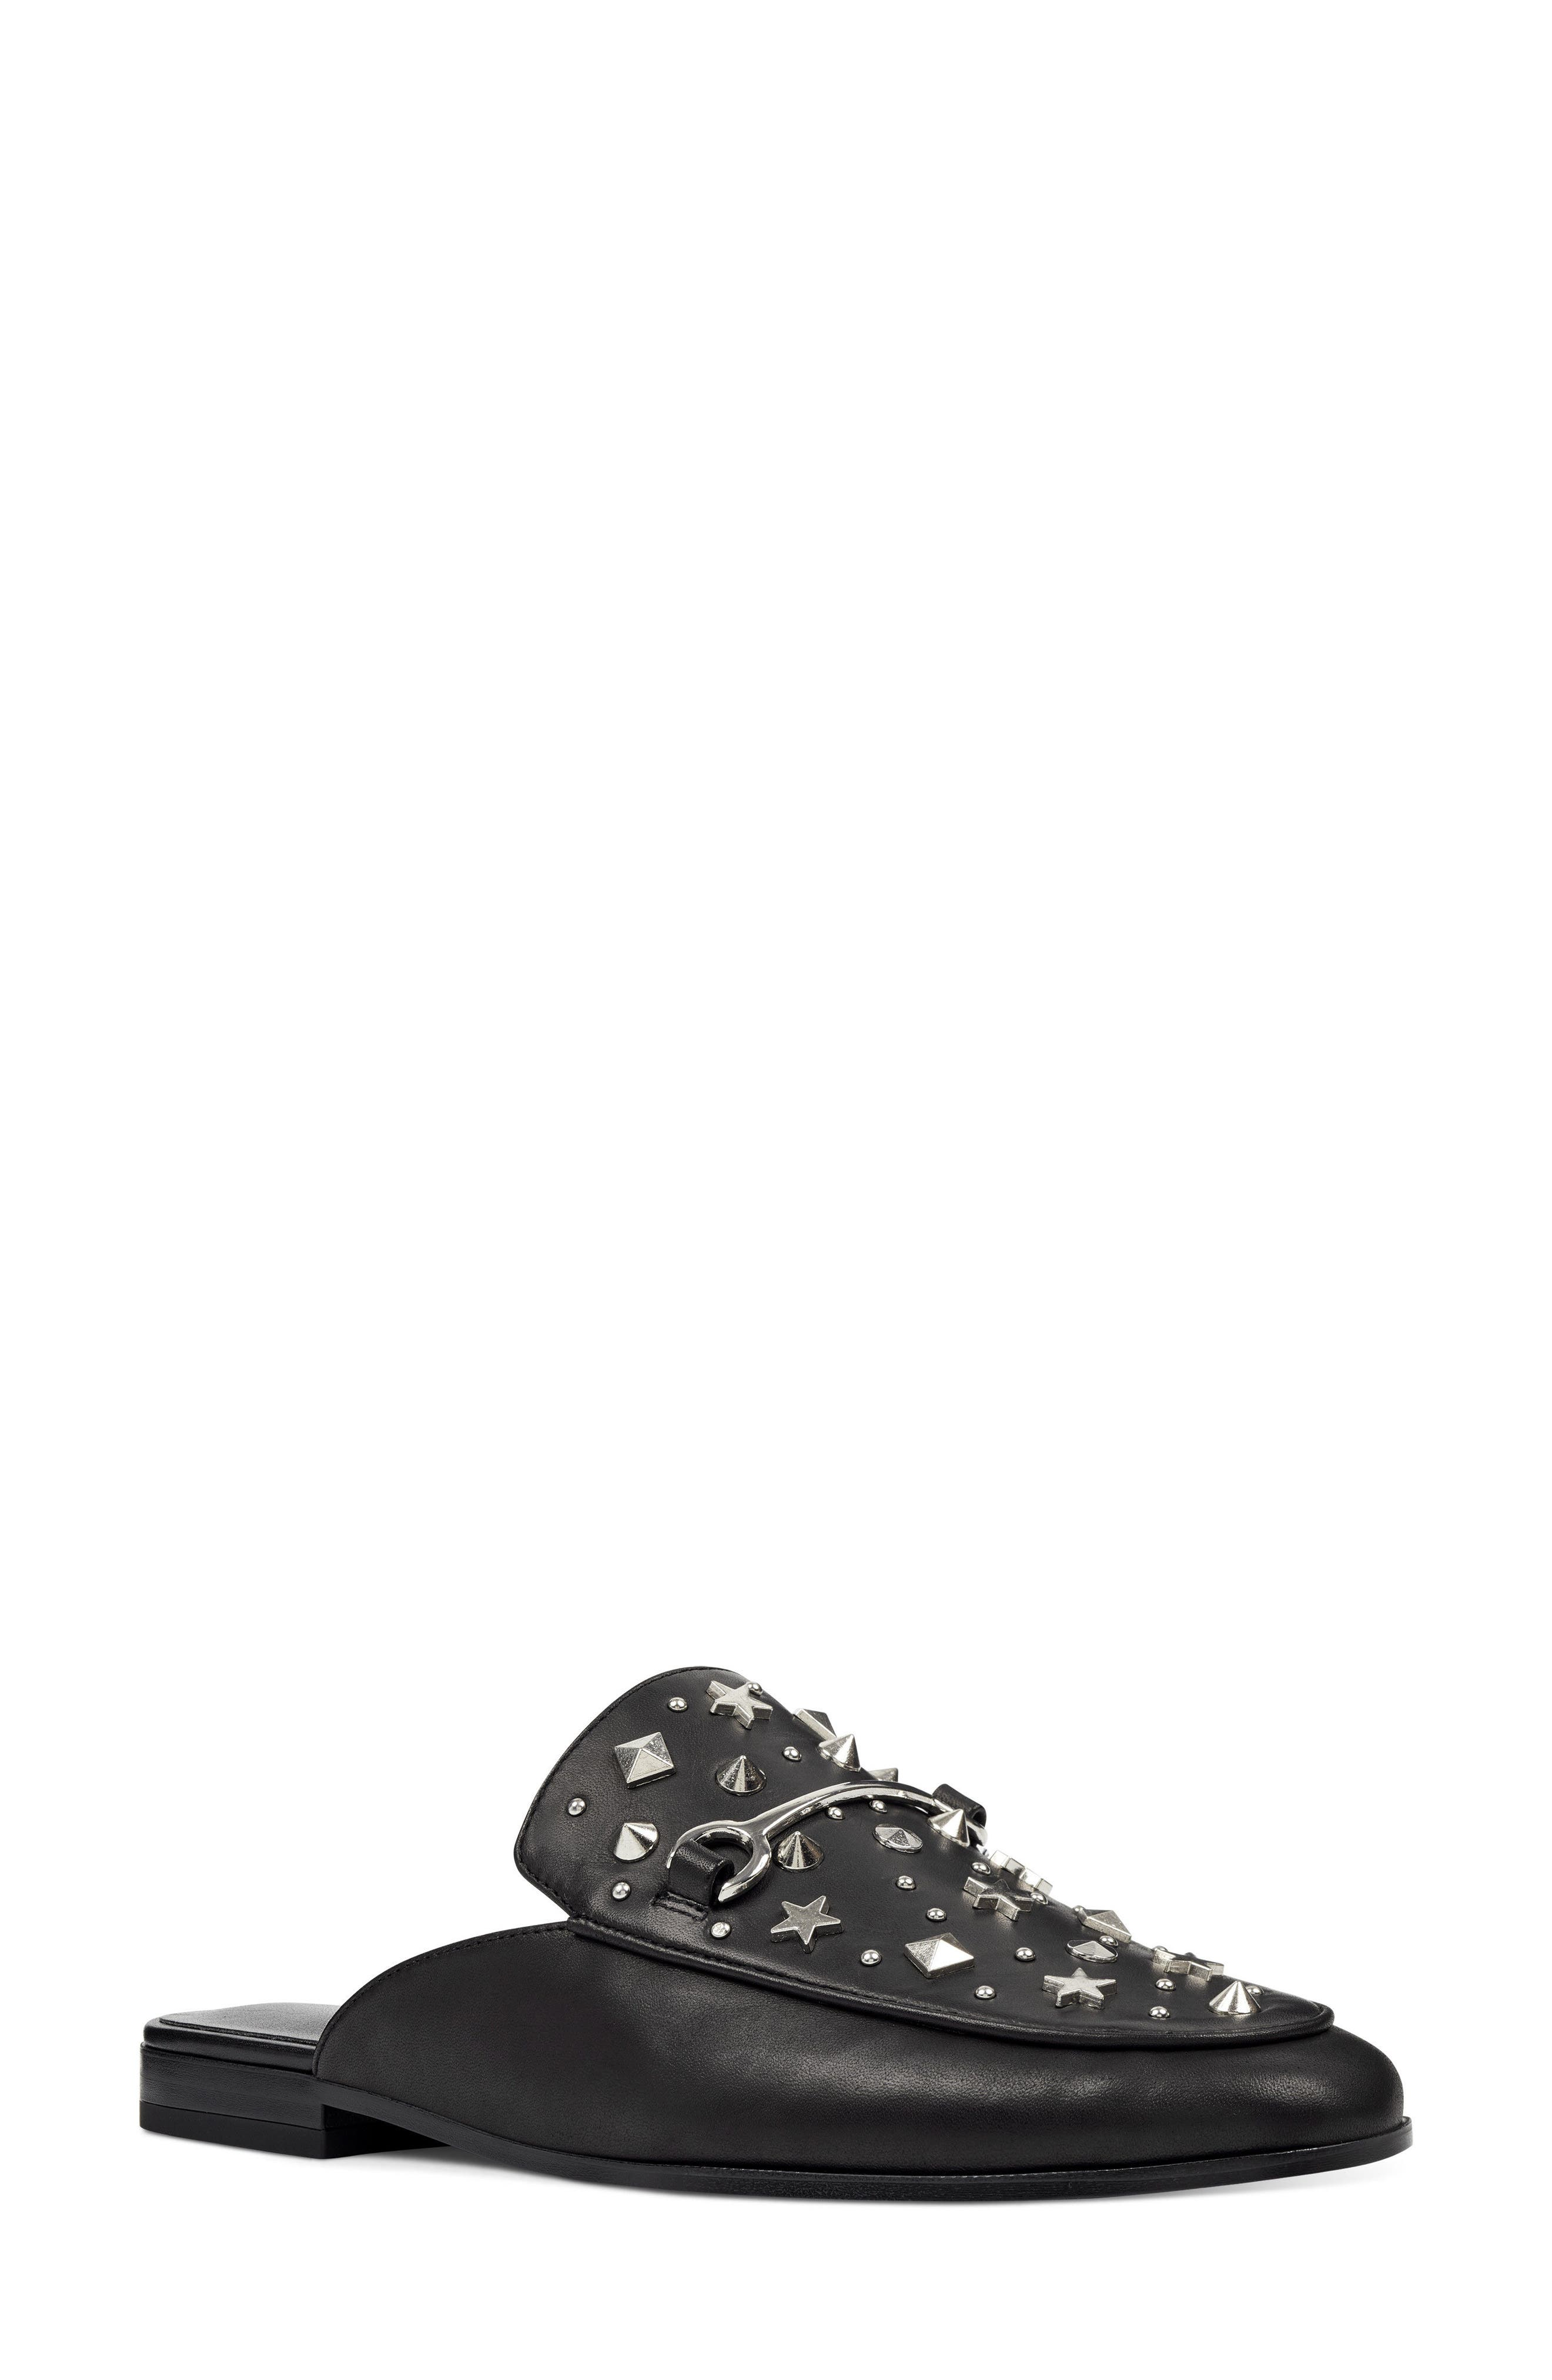 Welynne Mule,                             Main thumbnail 1, color,                             Black Leather